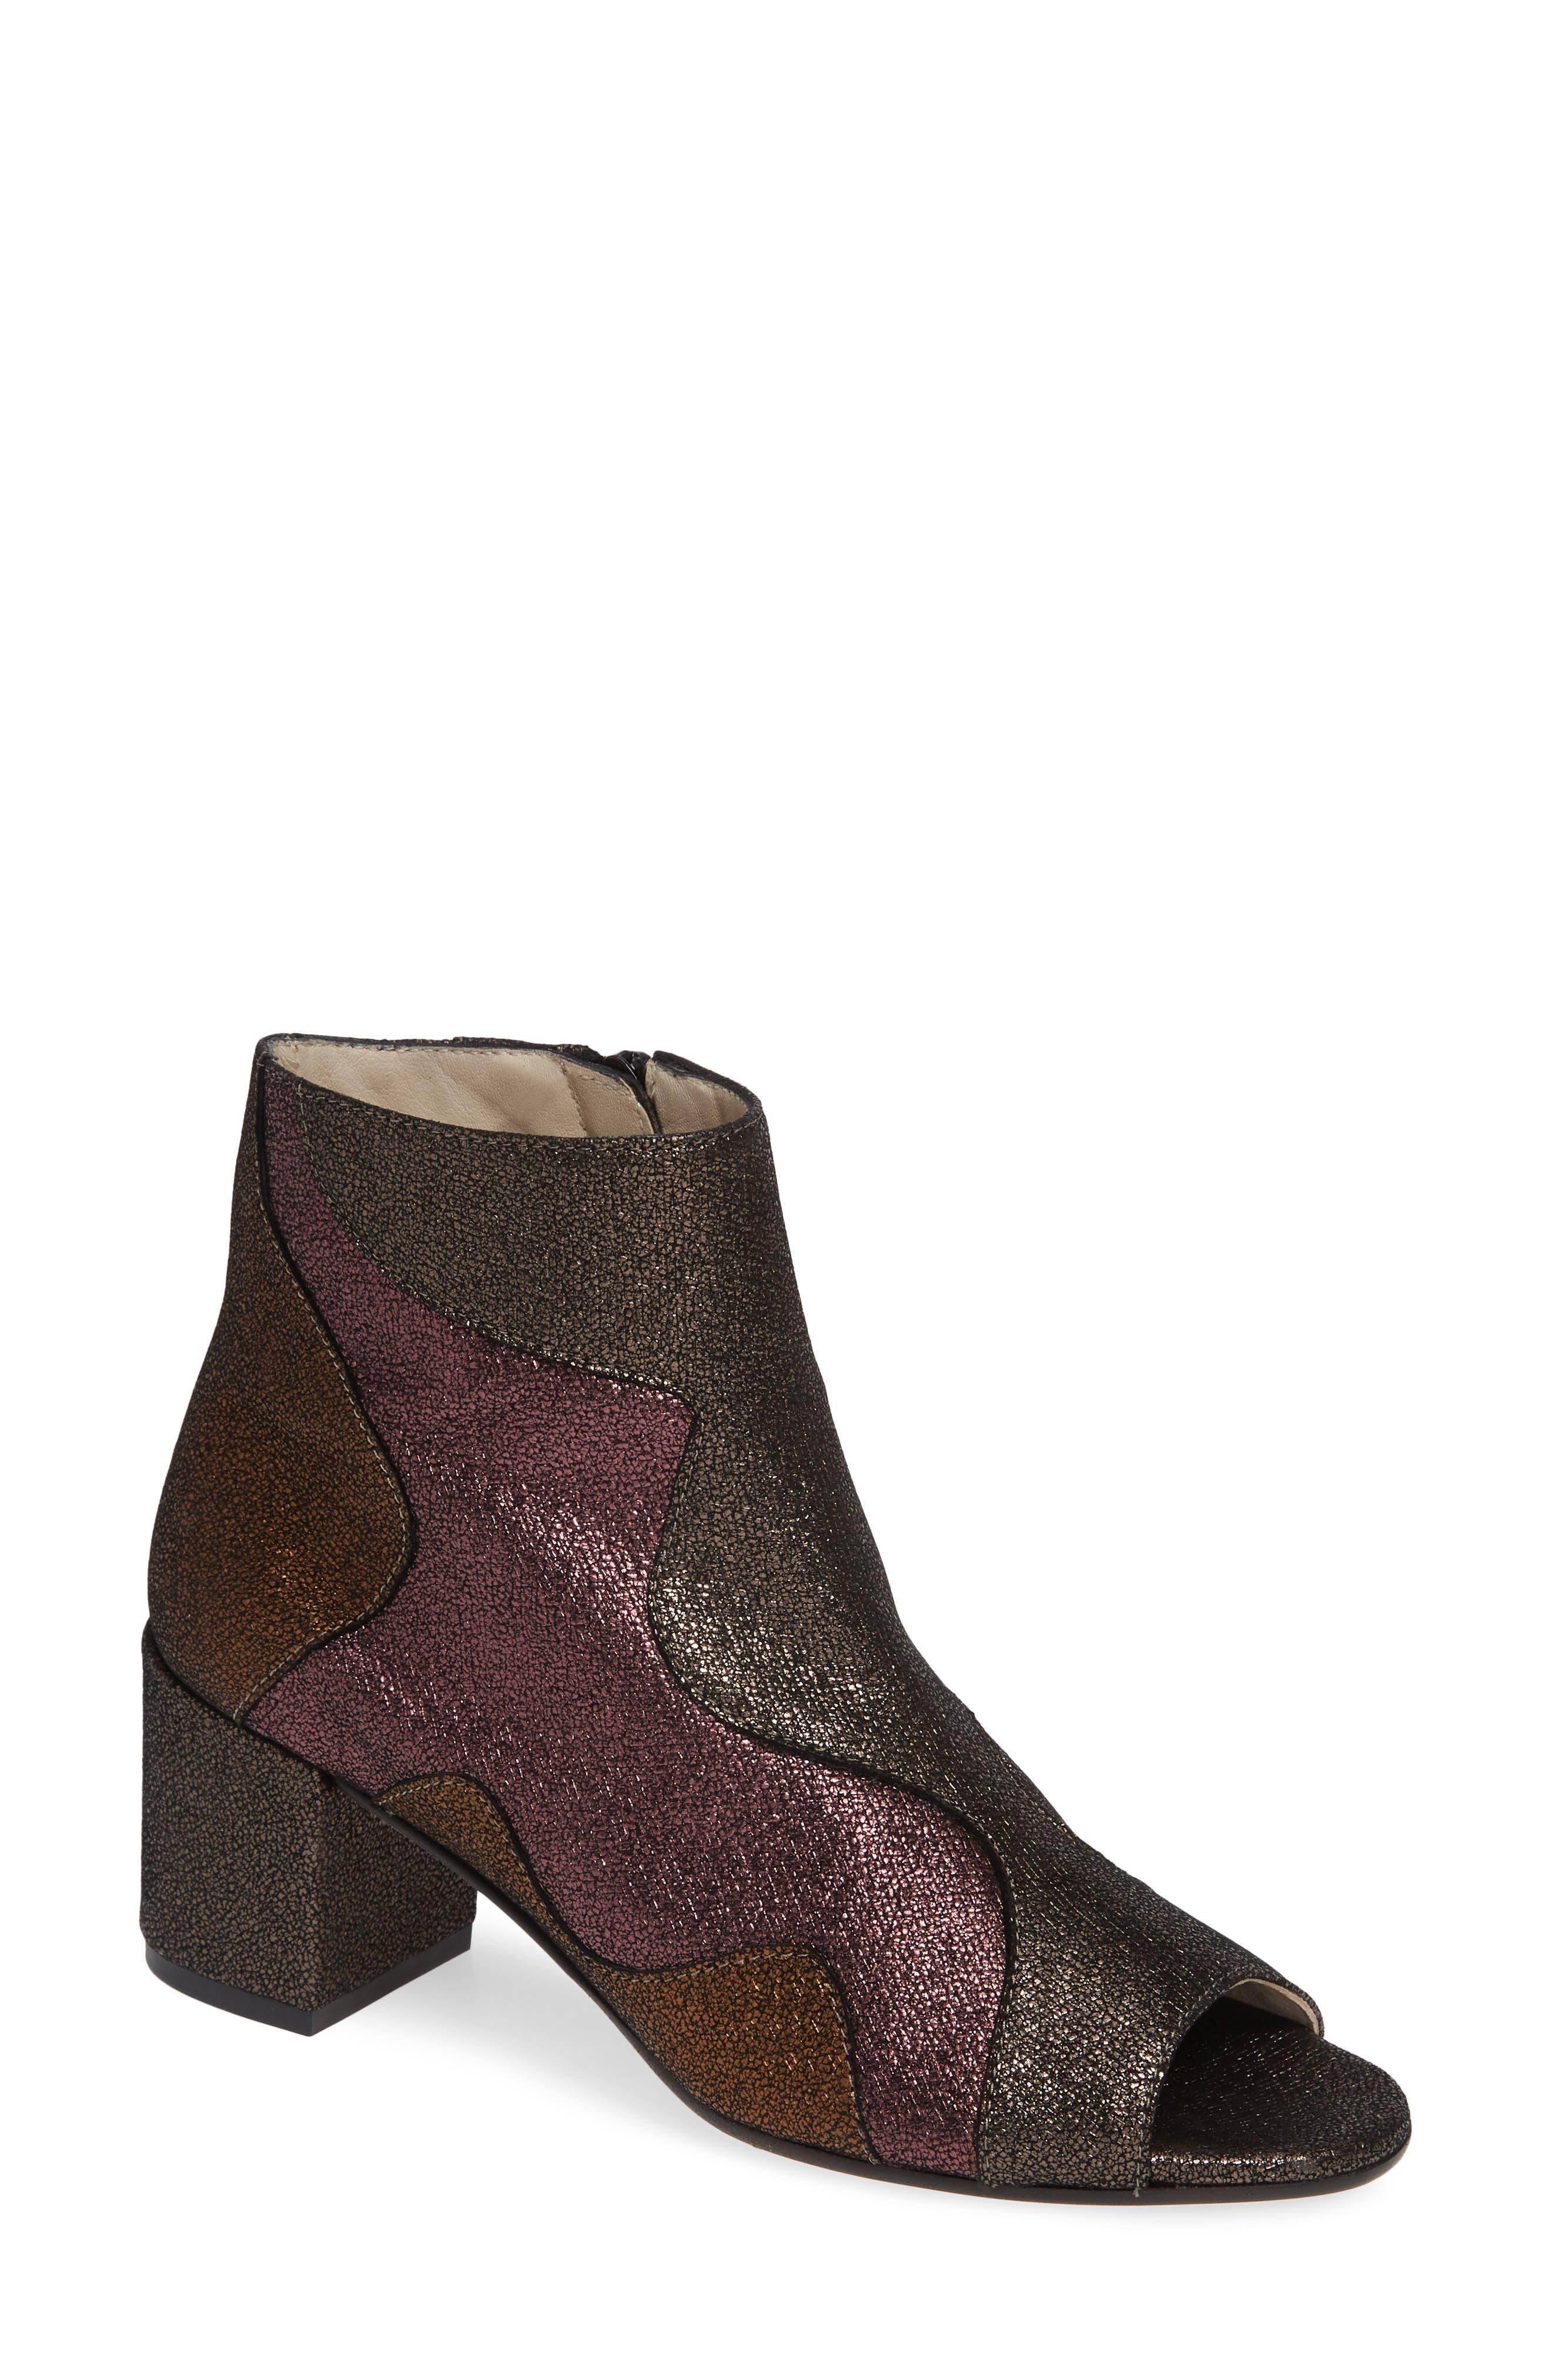 AMALFI BY RANGONI Caterina Colorblock Open Toe Bootie in Purple Leather